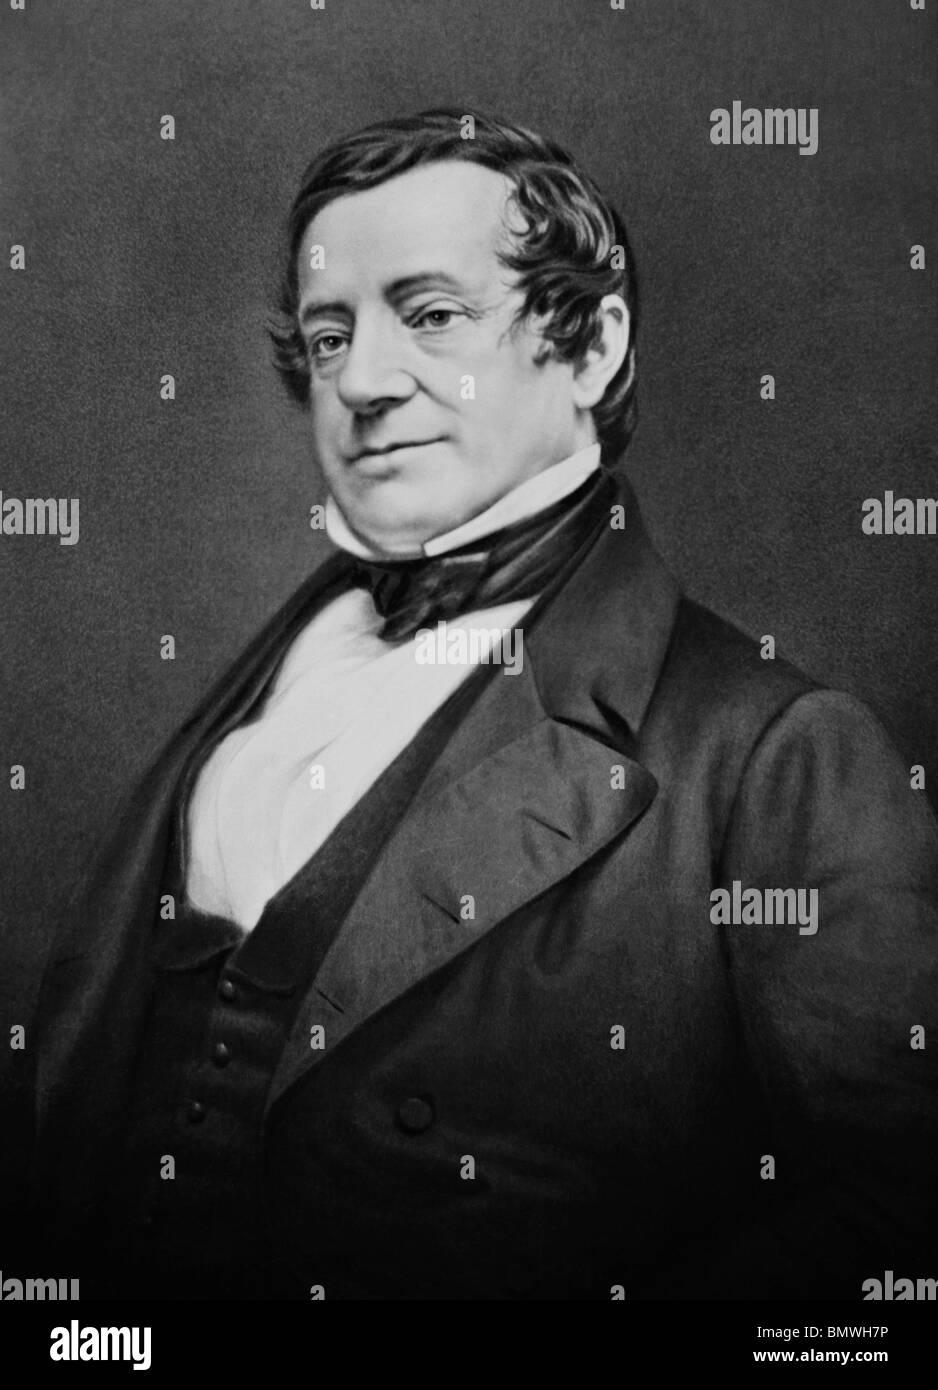 Daguerreotype portrait photo circa 1850s of American author, essayist, biographer and historian Washington Irving - Stock Image